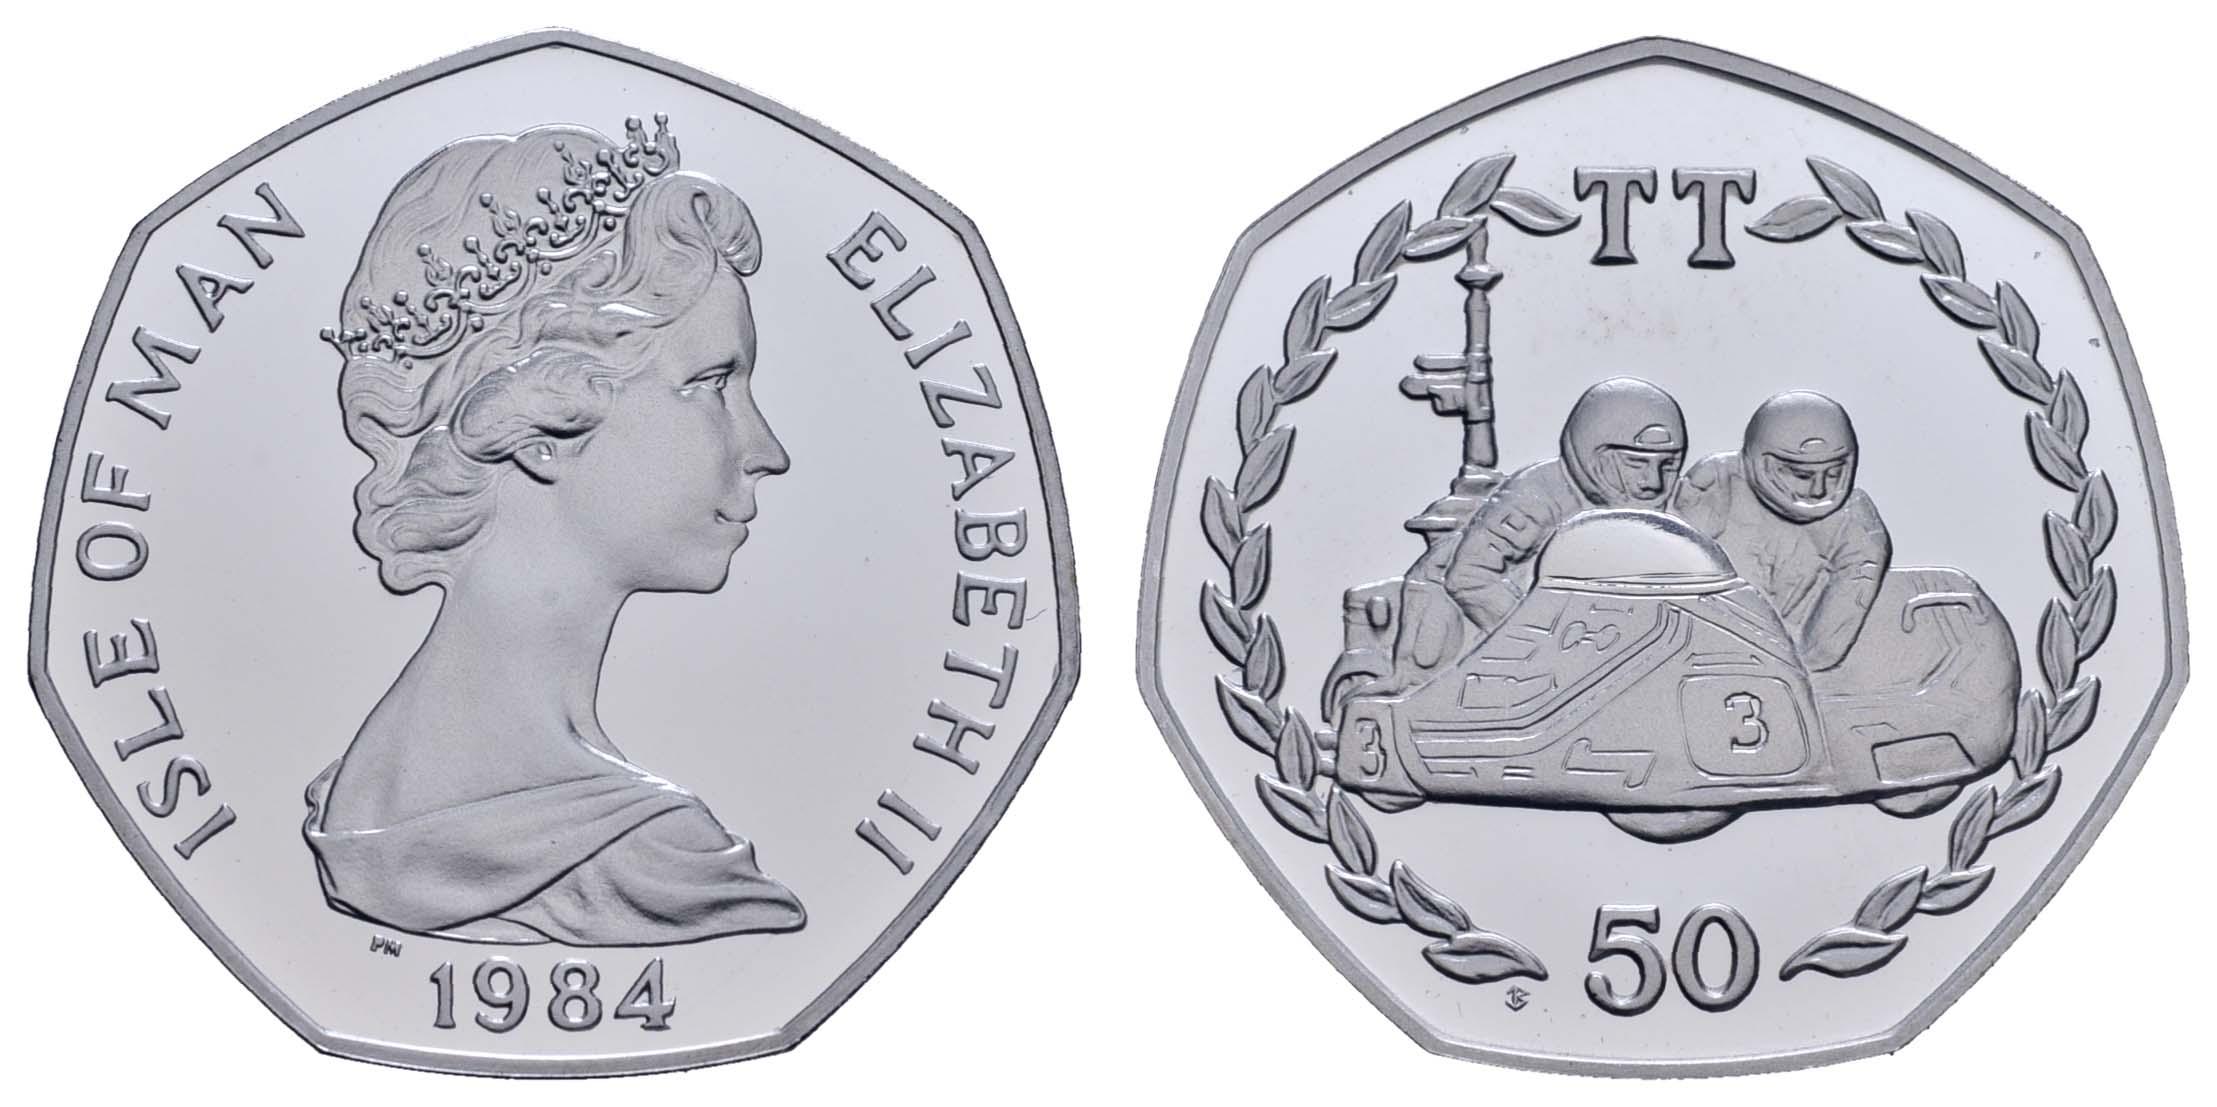 Lot 1612 - europa ab 1800 - Isle of Man -  Auktionshaus Ulrich Felzmann GmbH & Co. KG Coins single lots